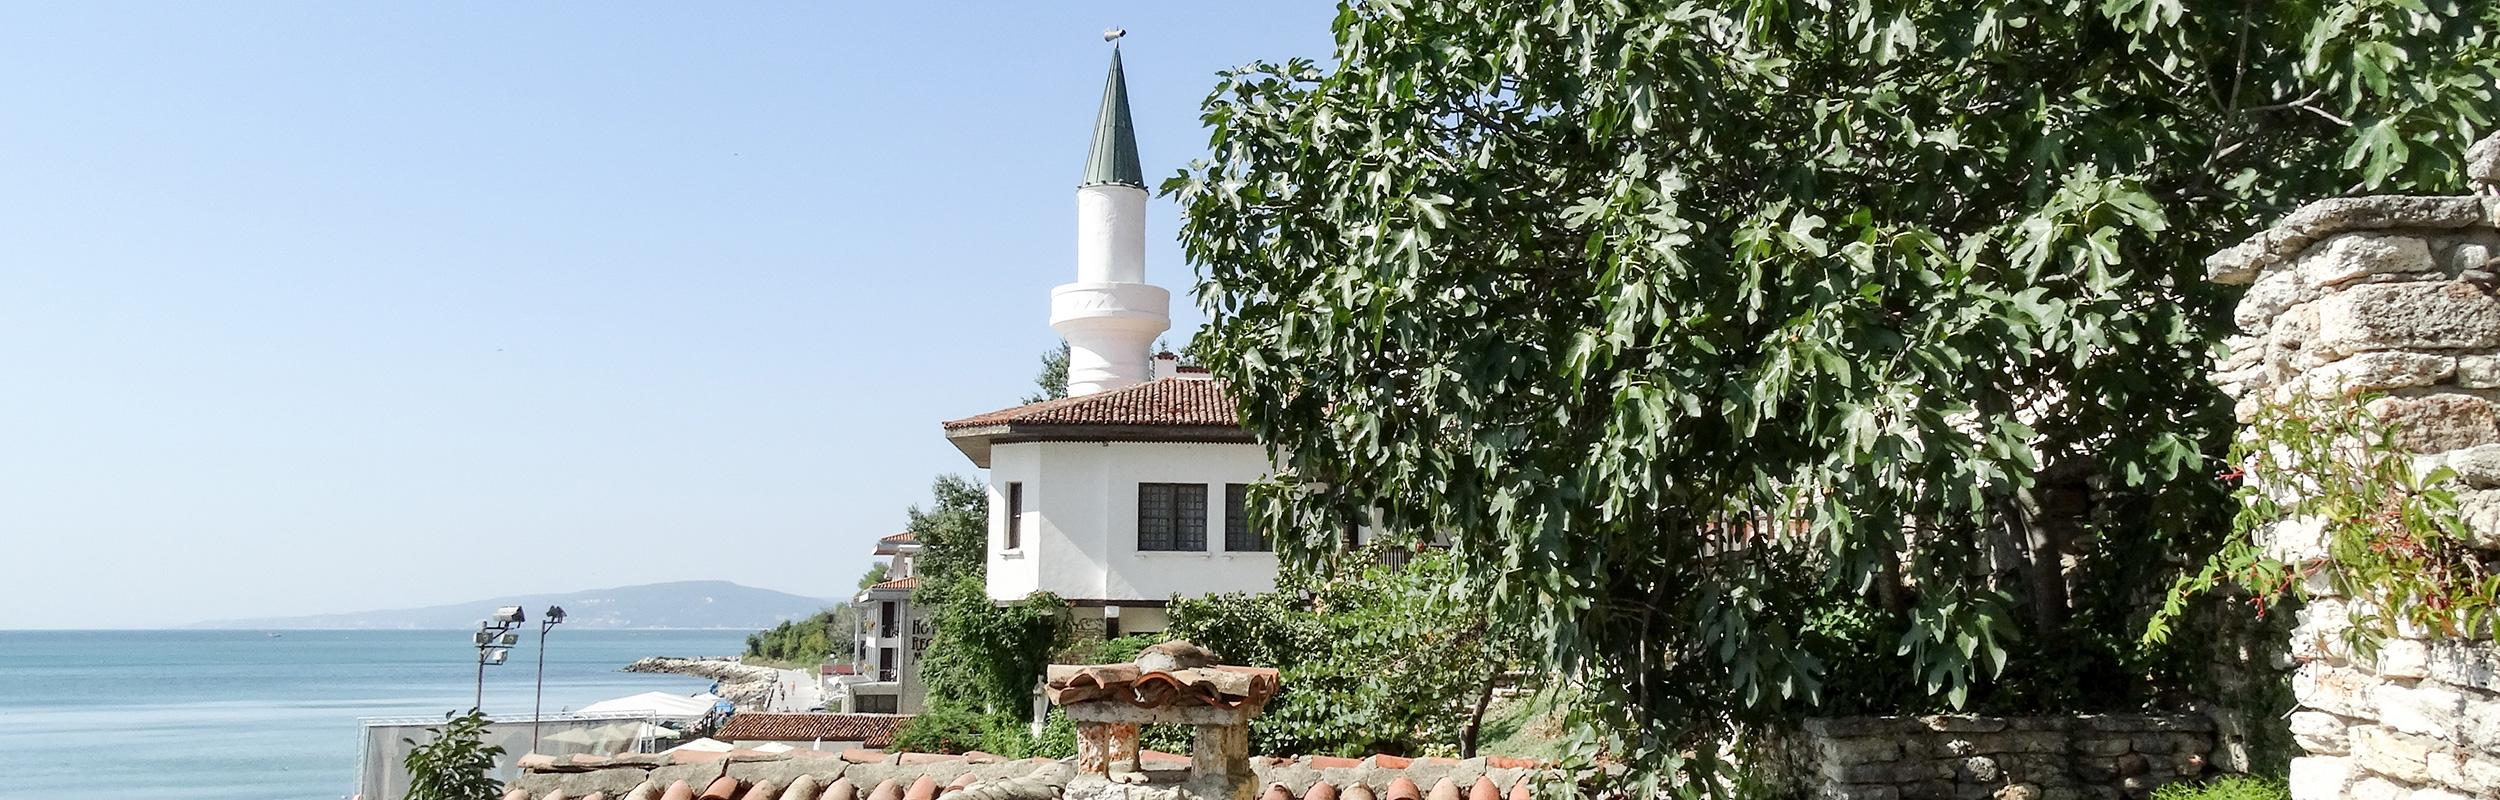 Backpack Nerd - Дворец и ботаническа градина в Балчик - 100 НТО